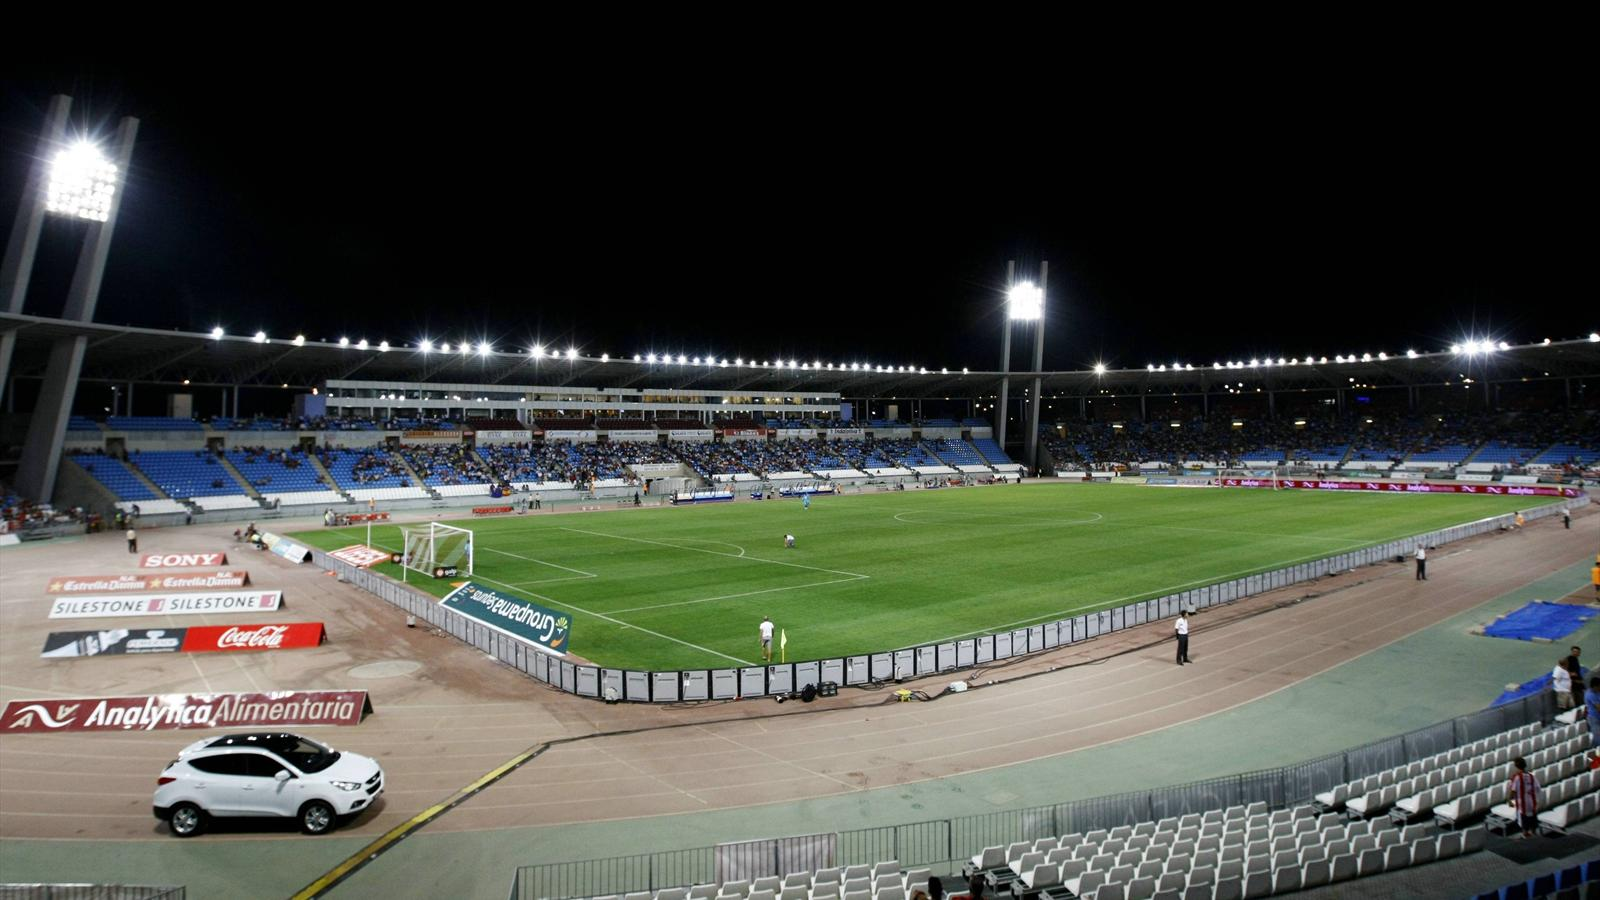 LIVE UD Almería - CF Reus Liga adelante - 10 June 2017 - Eurosport.com